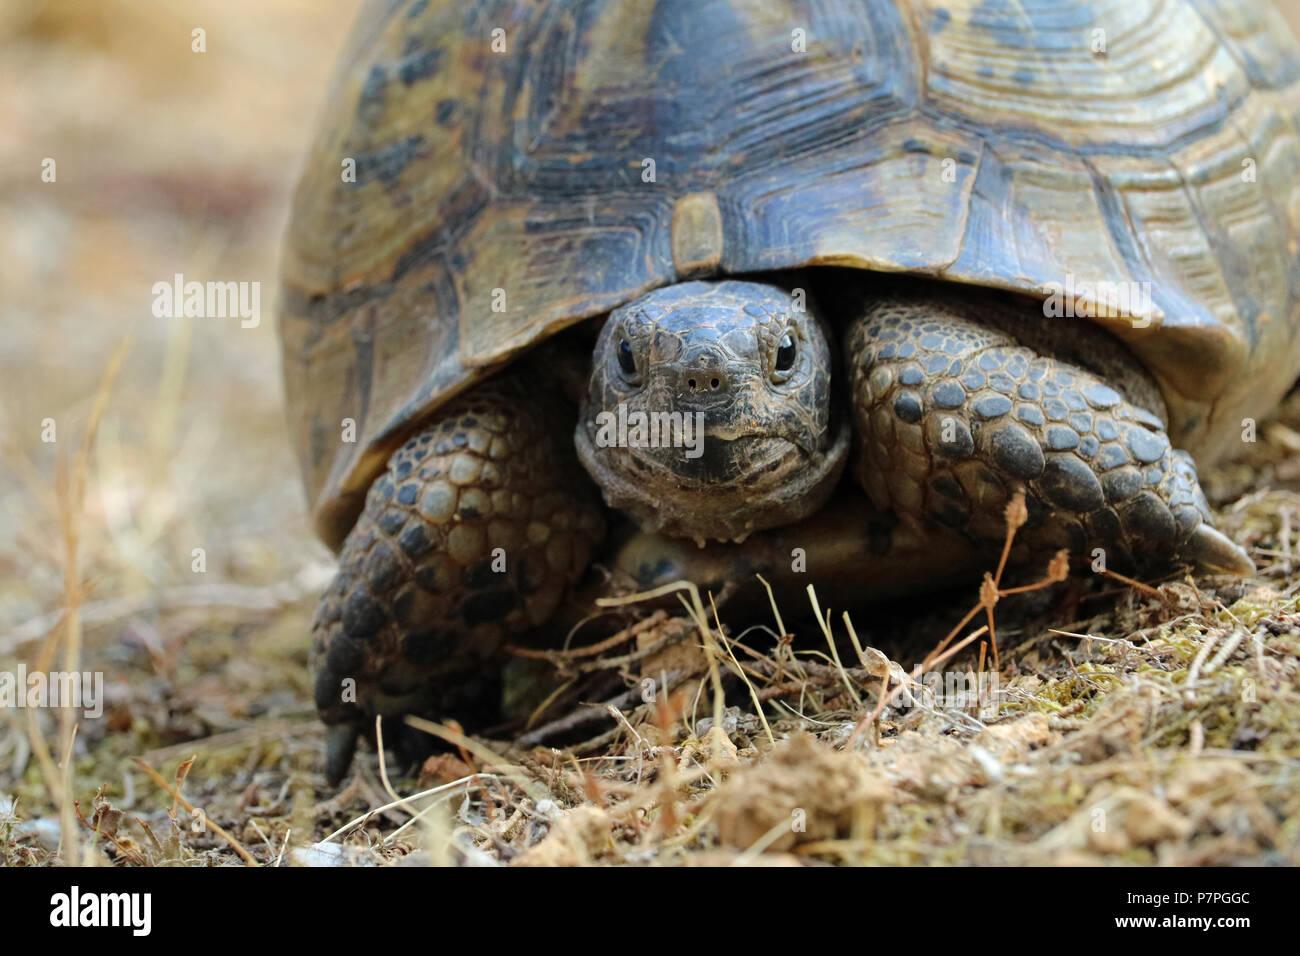 close up of testudo hermanni, turtle on natural mediterranean environment - Stock Image